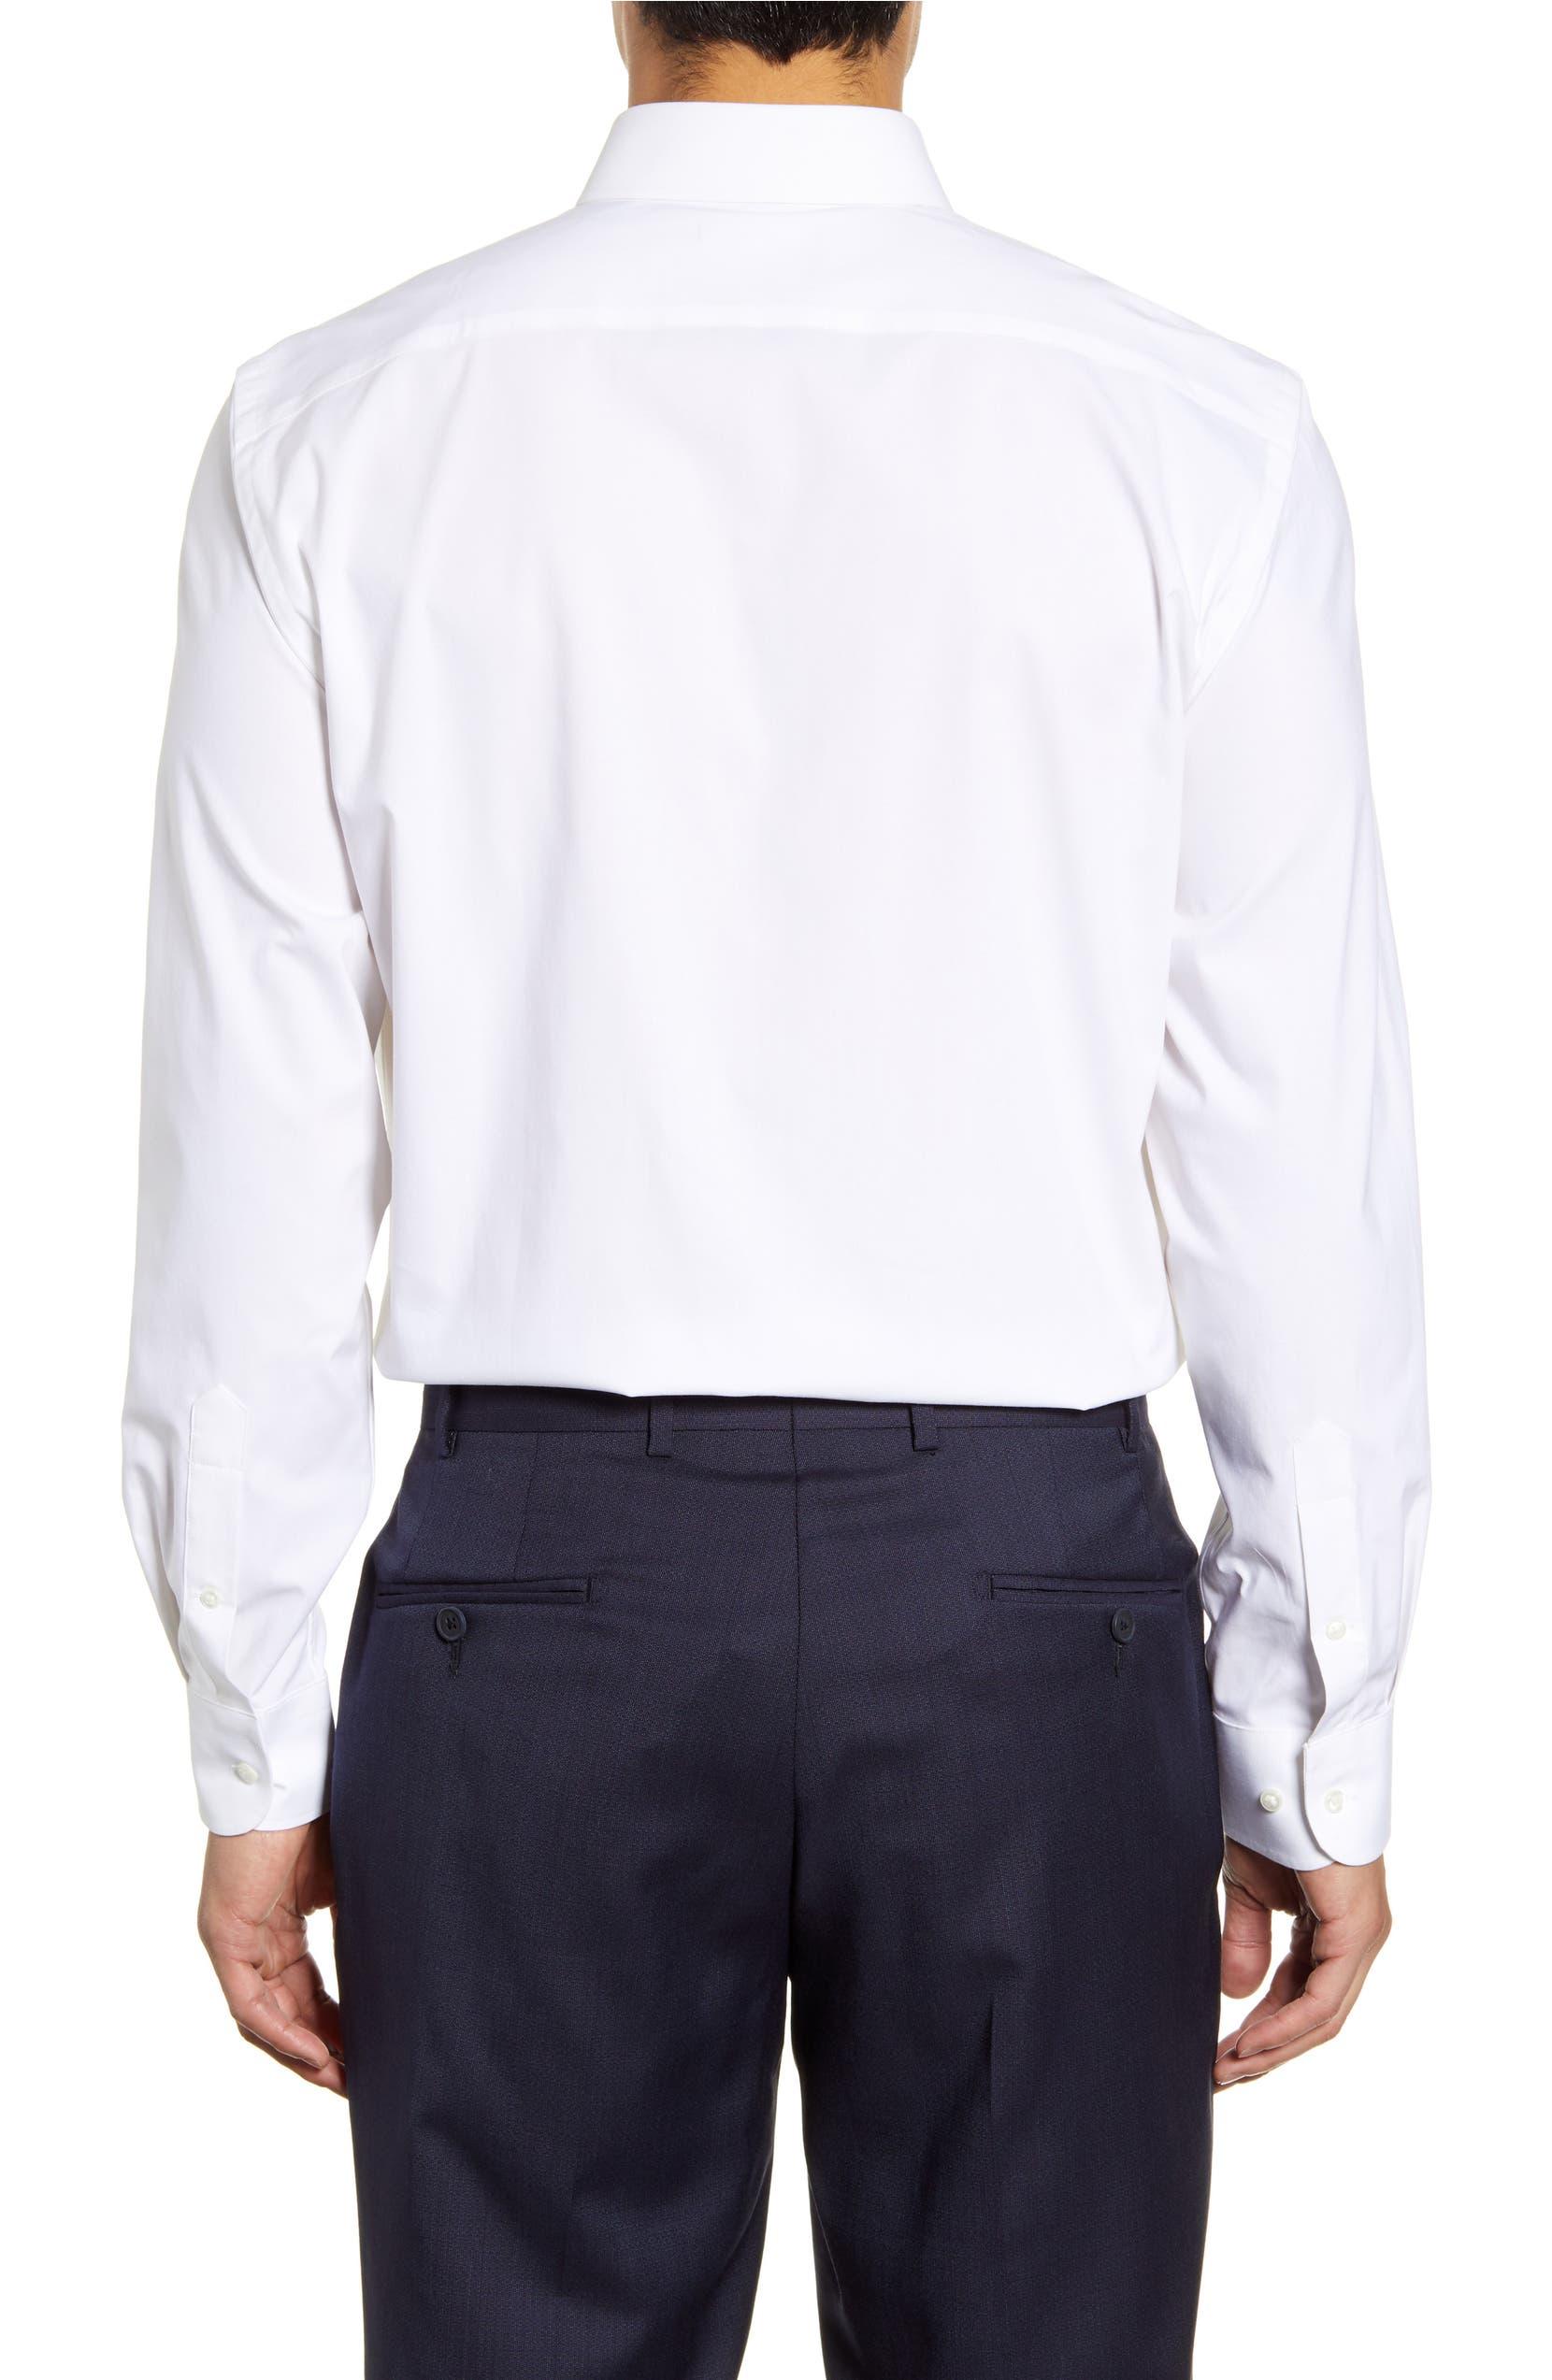 b12482581757 Nordstrom Men's Shop Tech-Smart Traditional Fit Stretch Pinpoint Dress  Shirt | Nordstrom